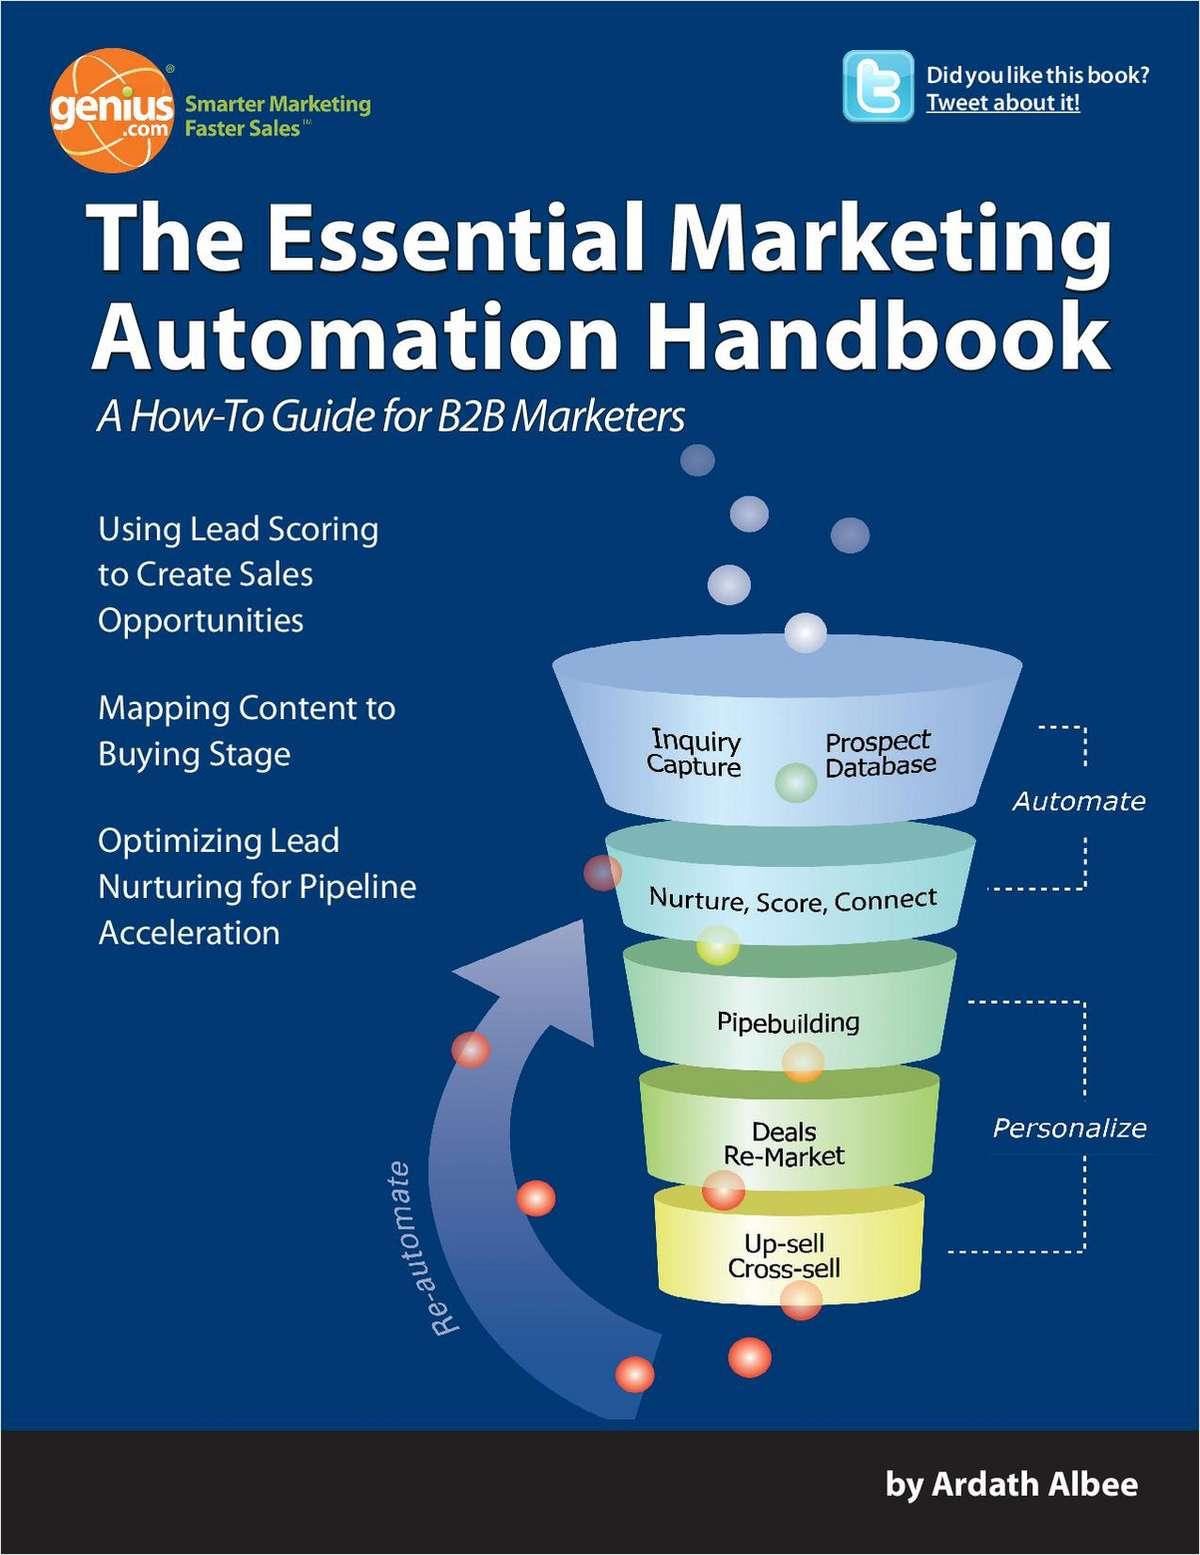 The Essential Marketing Automation Handbook